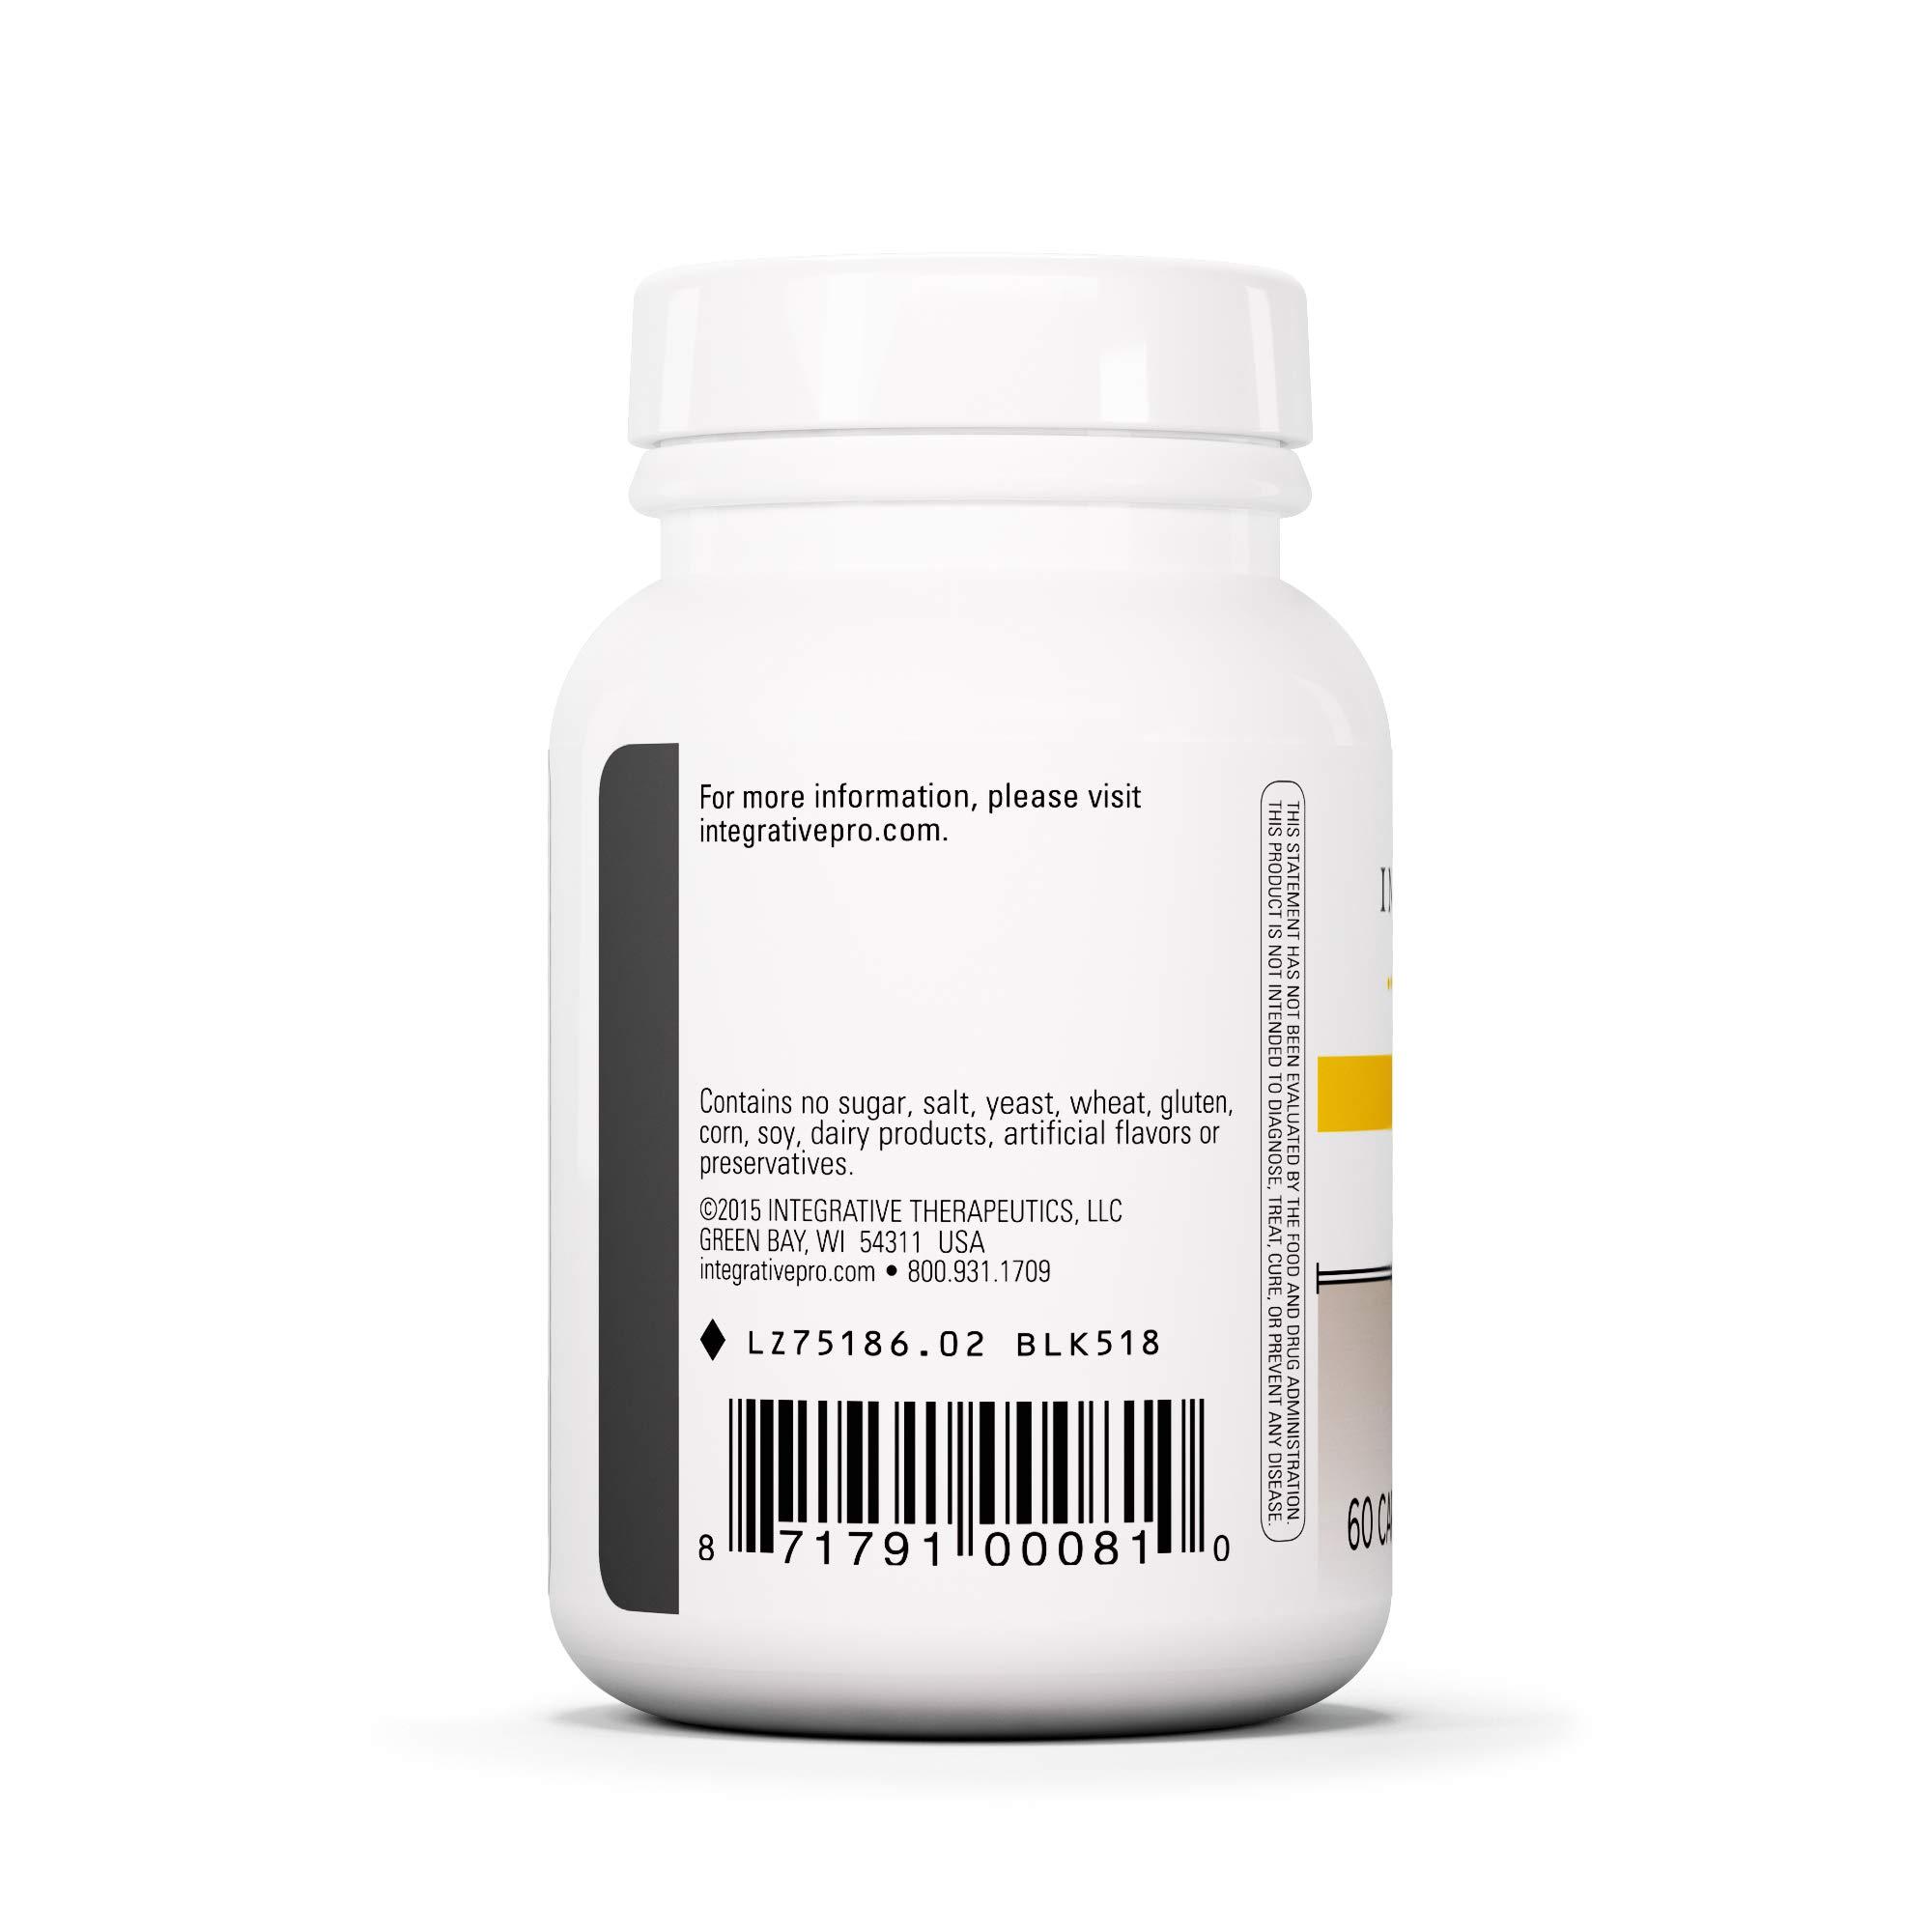 Integrative Therapeutics - 7-KETO DHEA Metabolite - 60 Capsules by Integrative Therapeutics (Image #3)